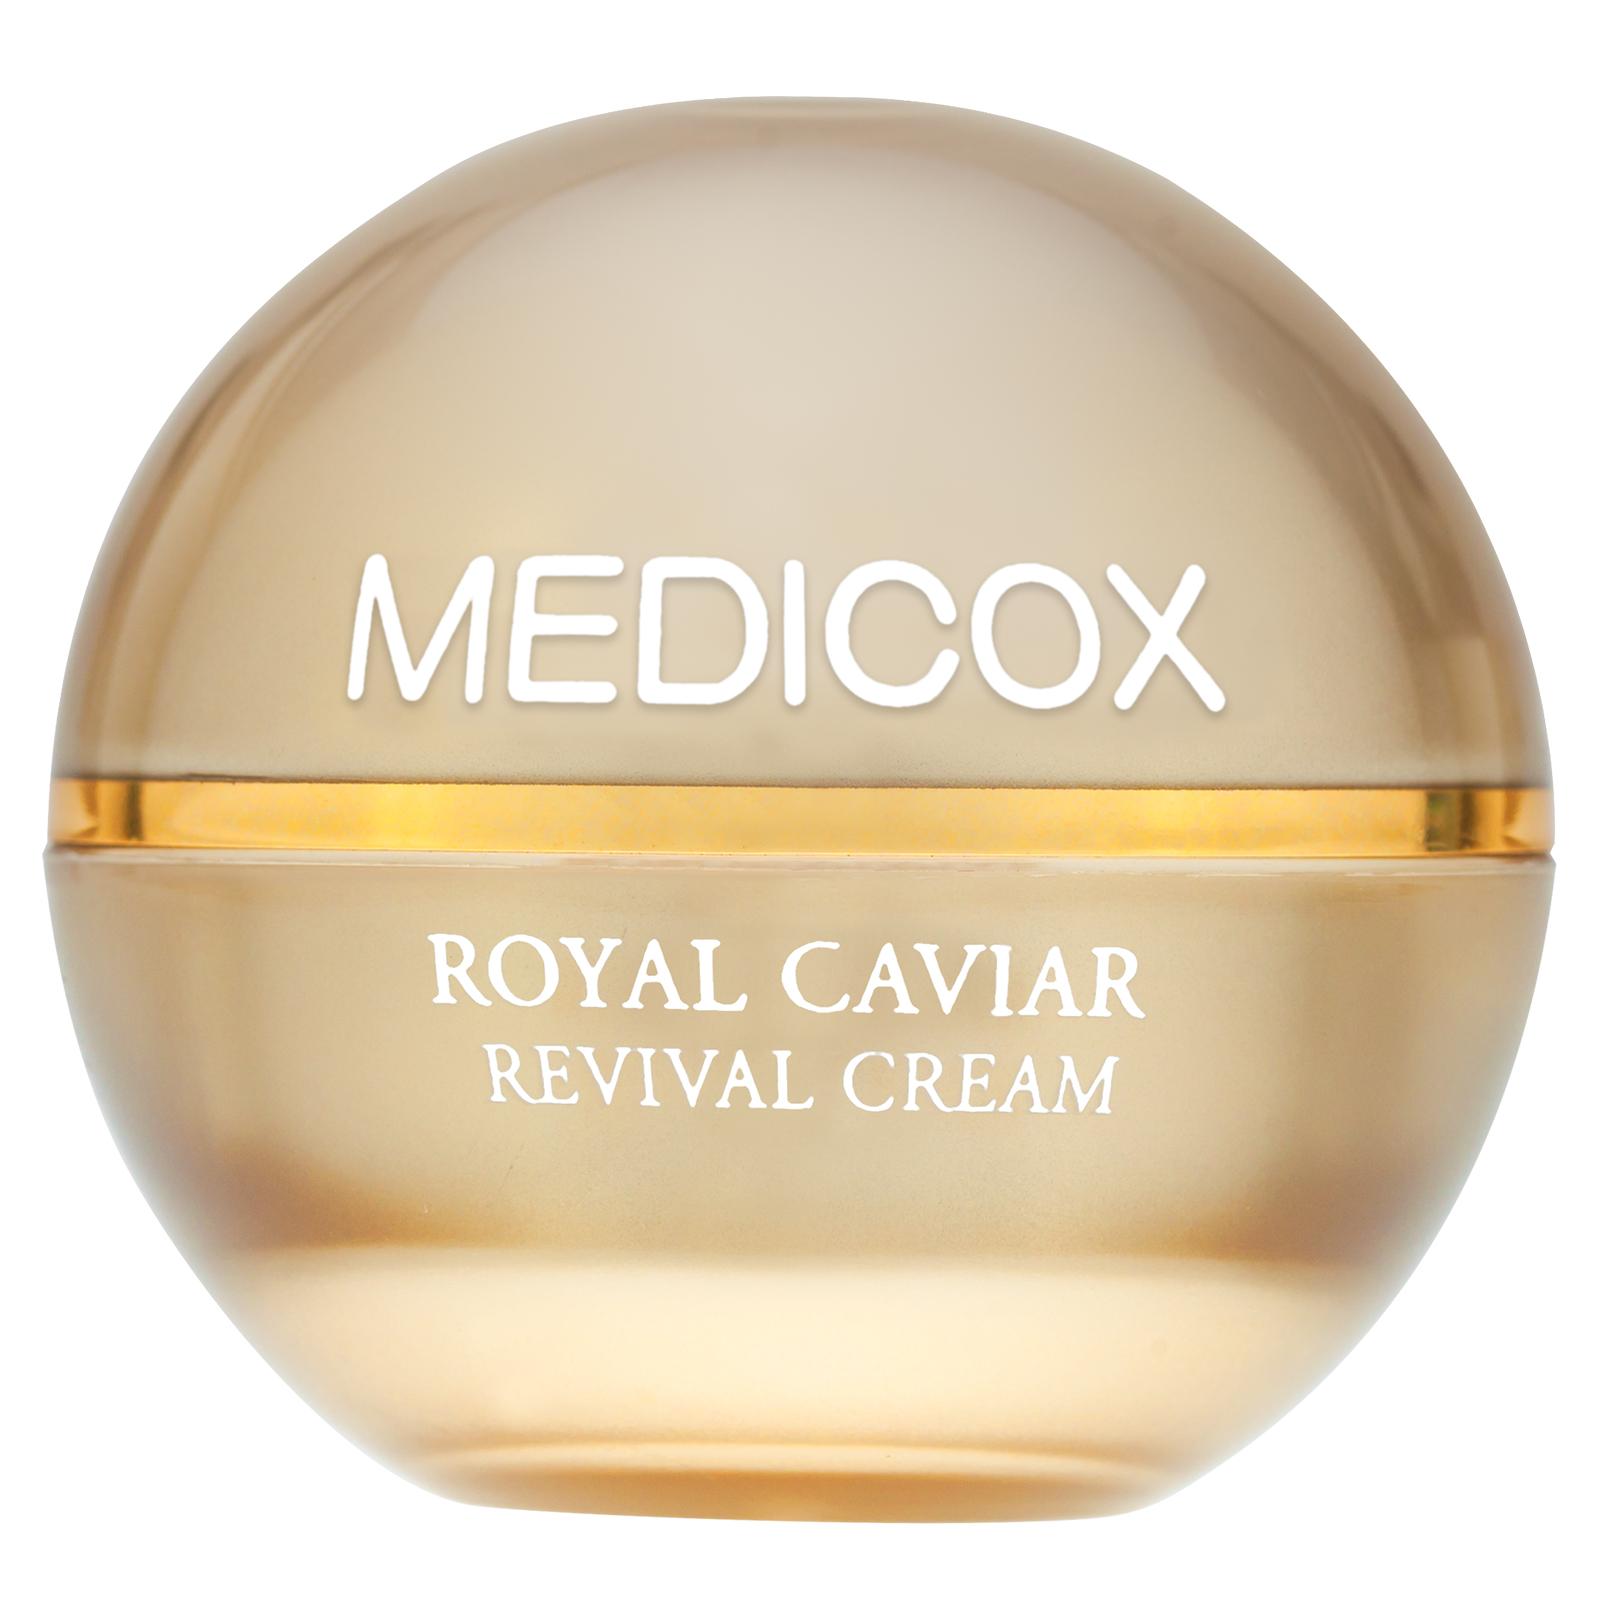 Medicox Royal Caviar Revival Cream 0.53oz, 15g